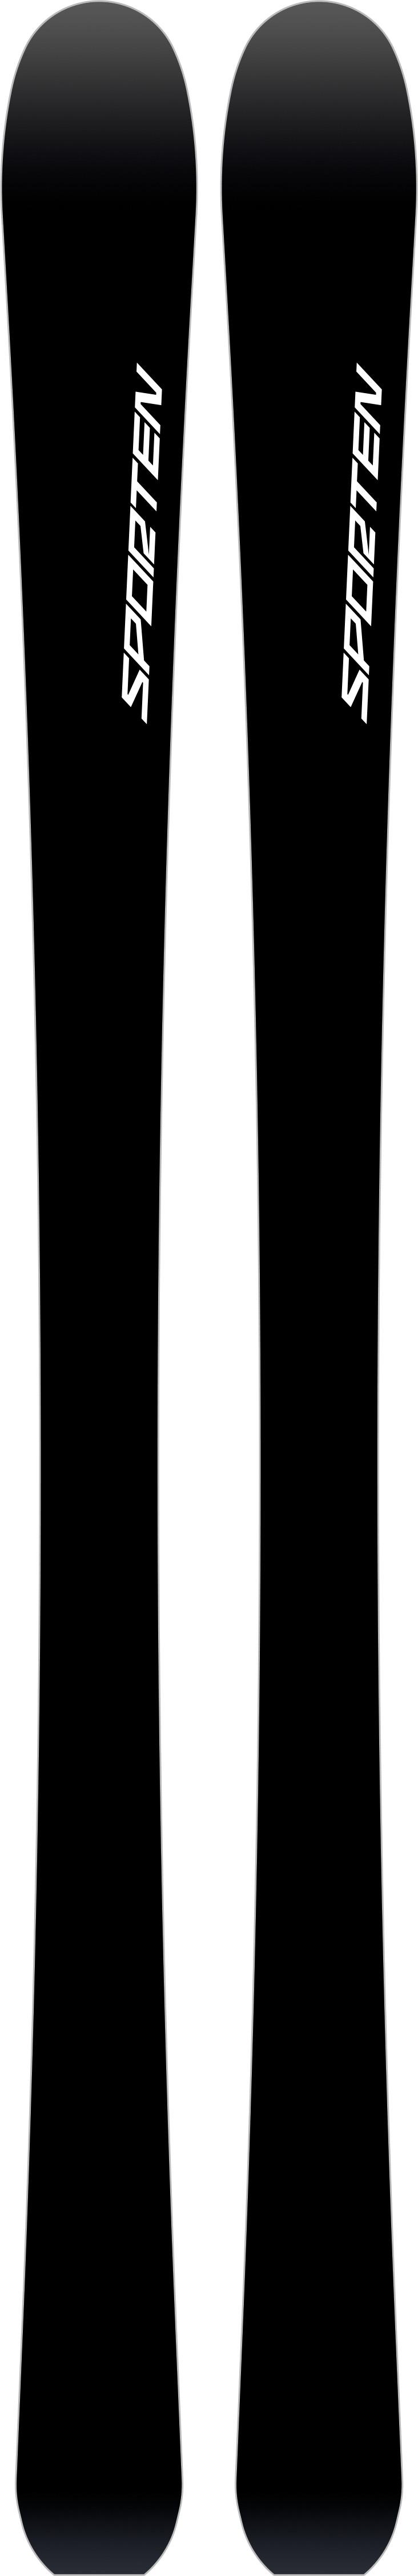 Iridium 4 W base.jpg